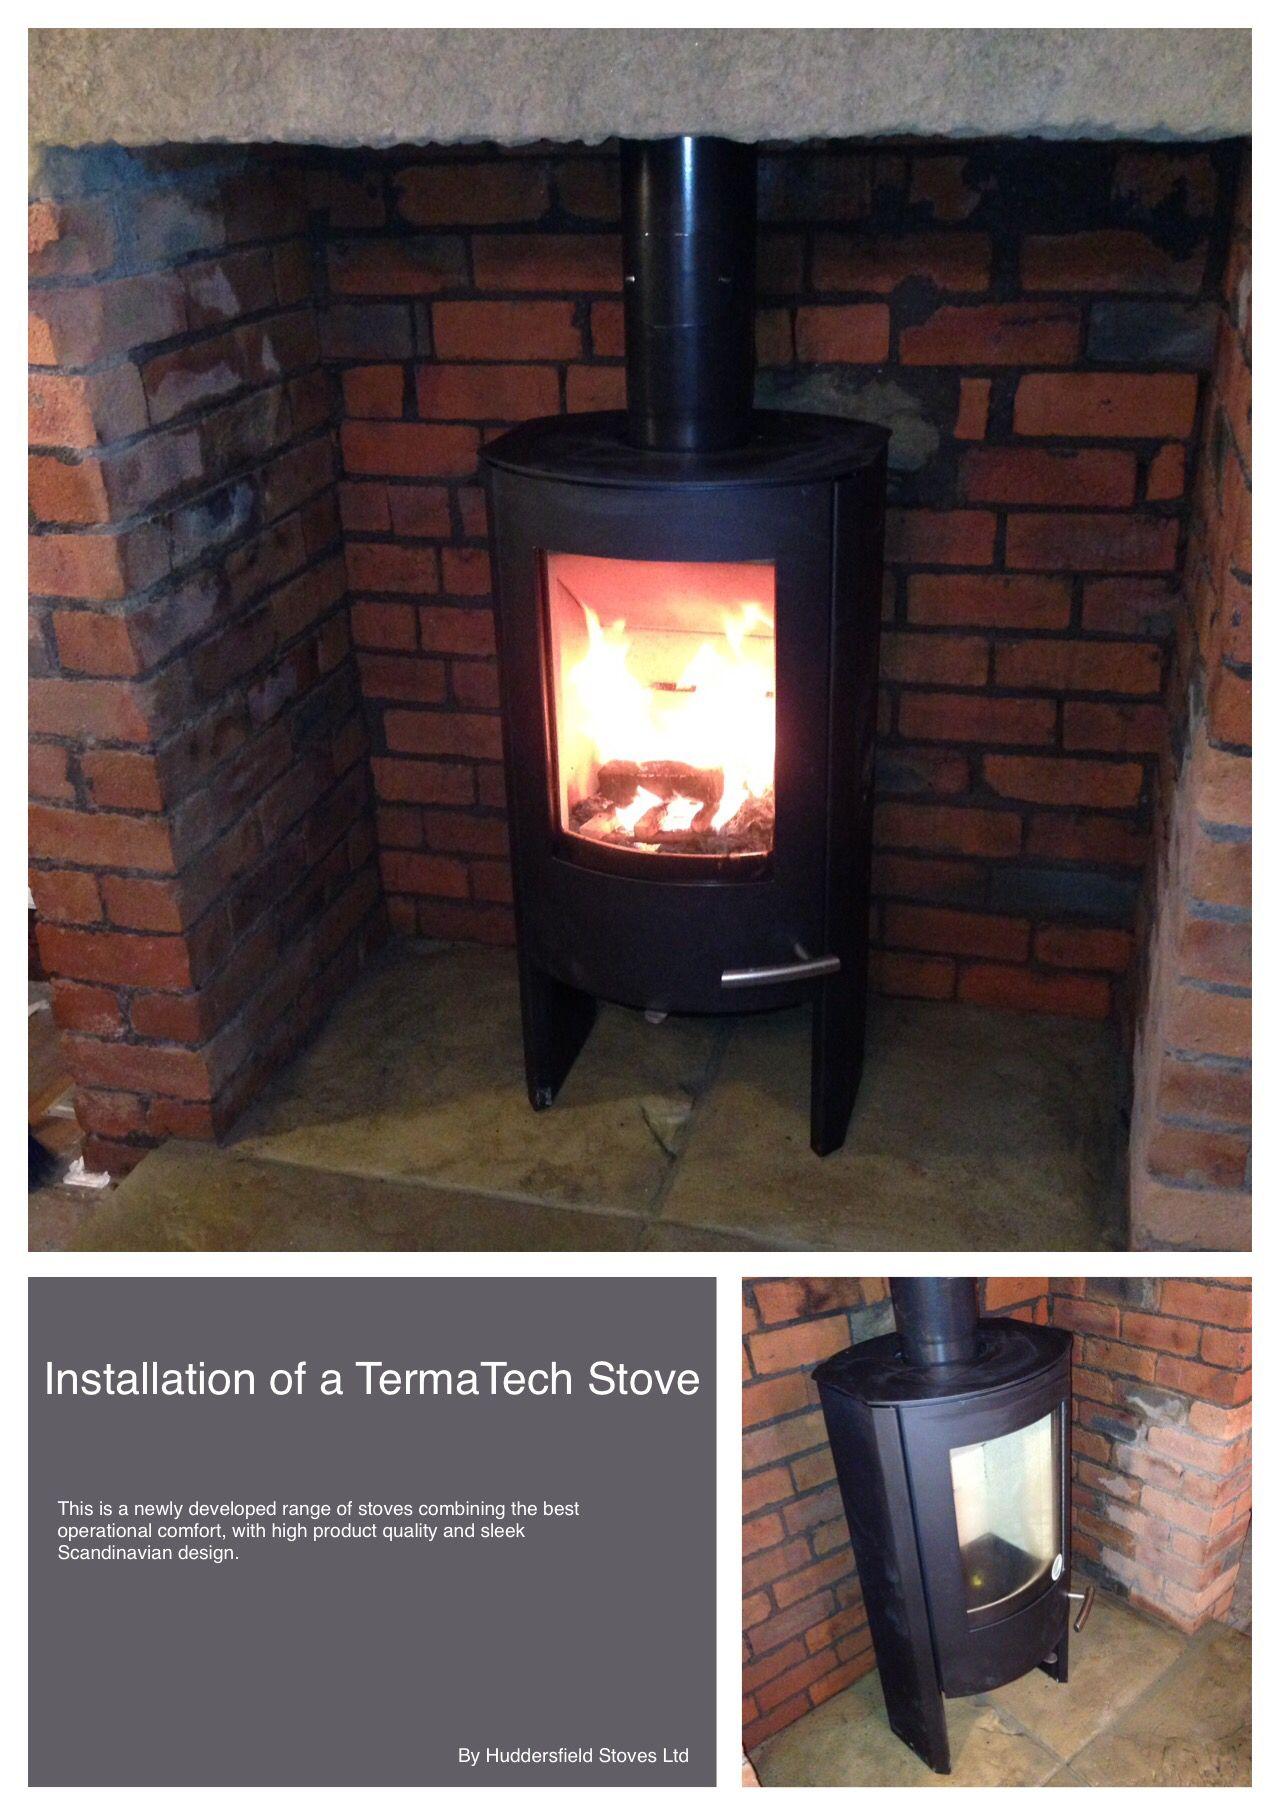 Termatech wood burning stove Termatech stoves